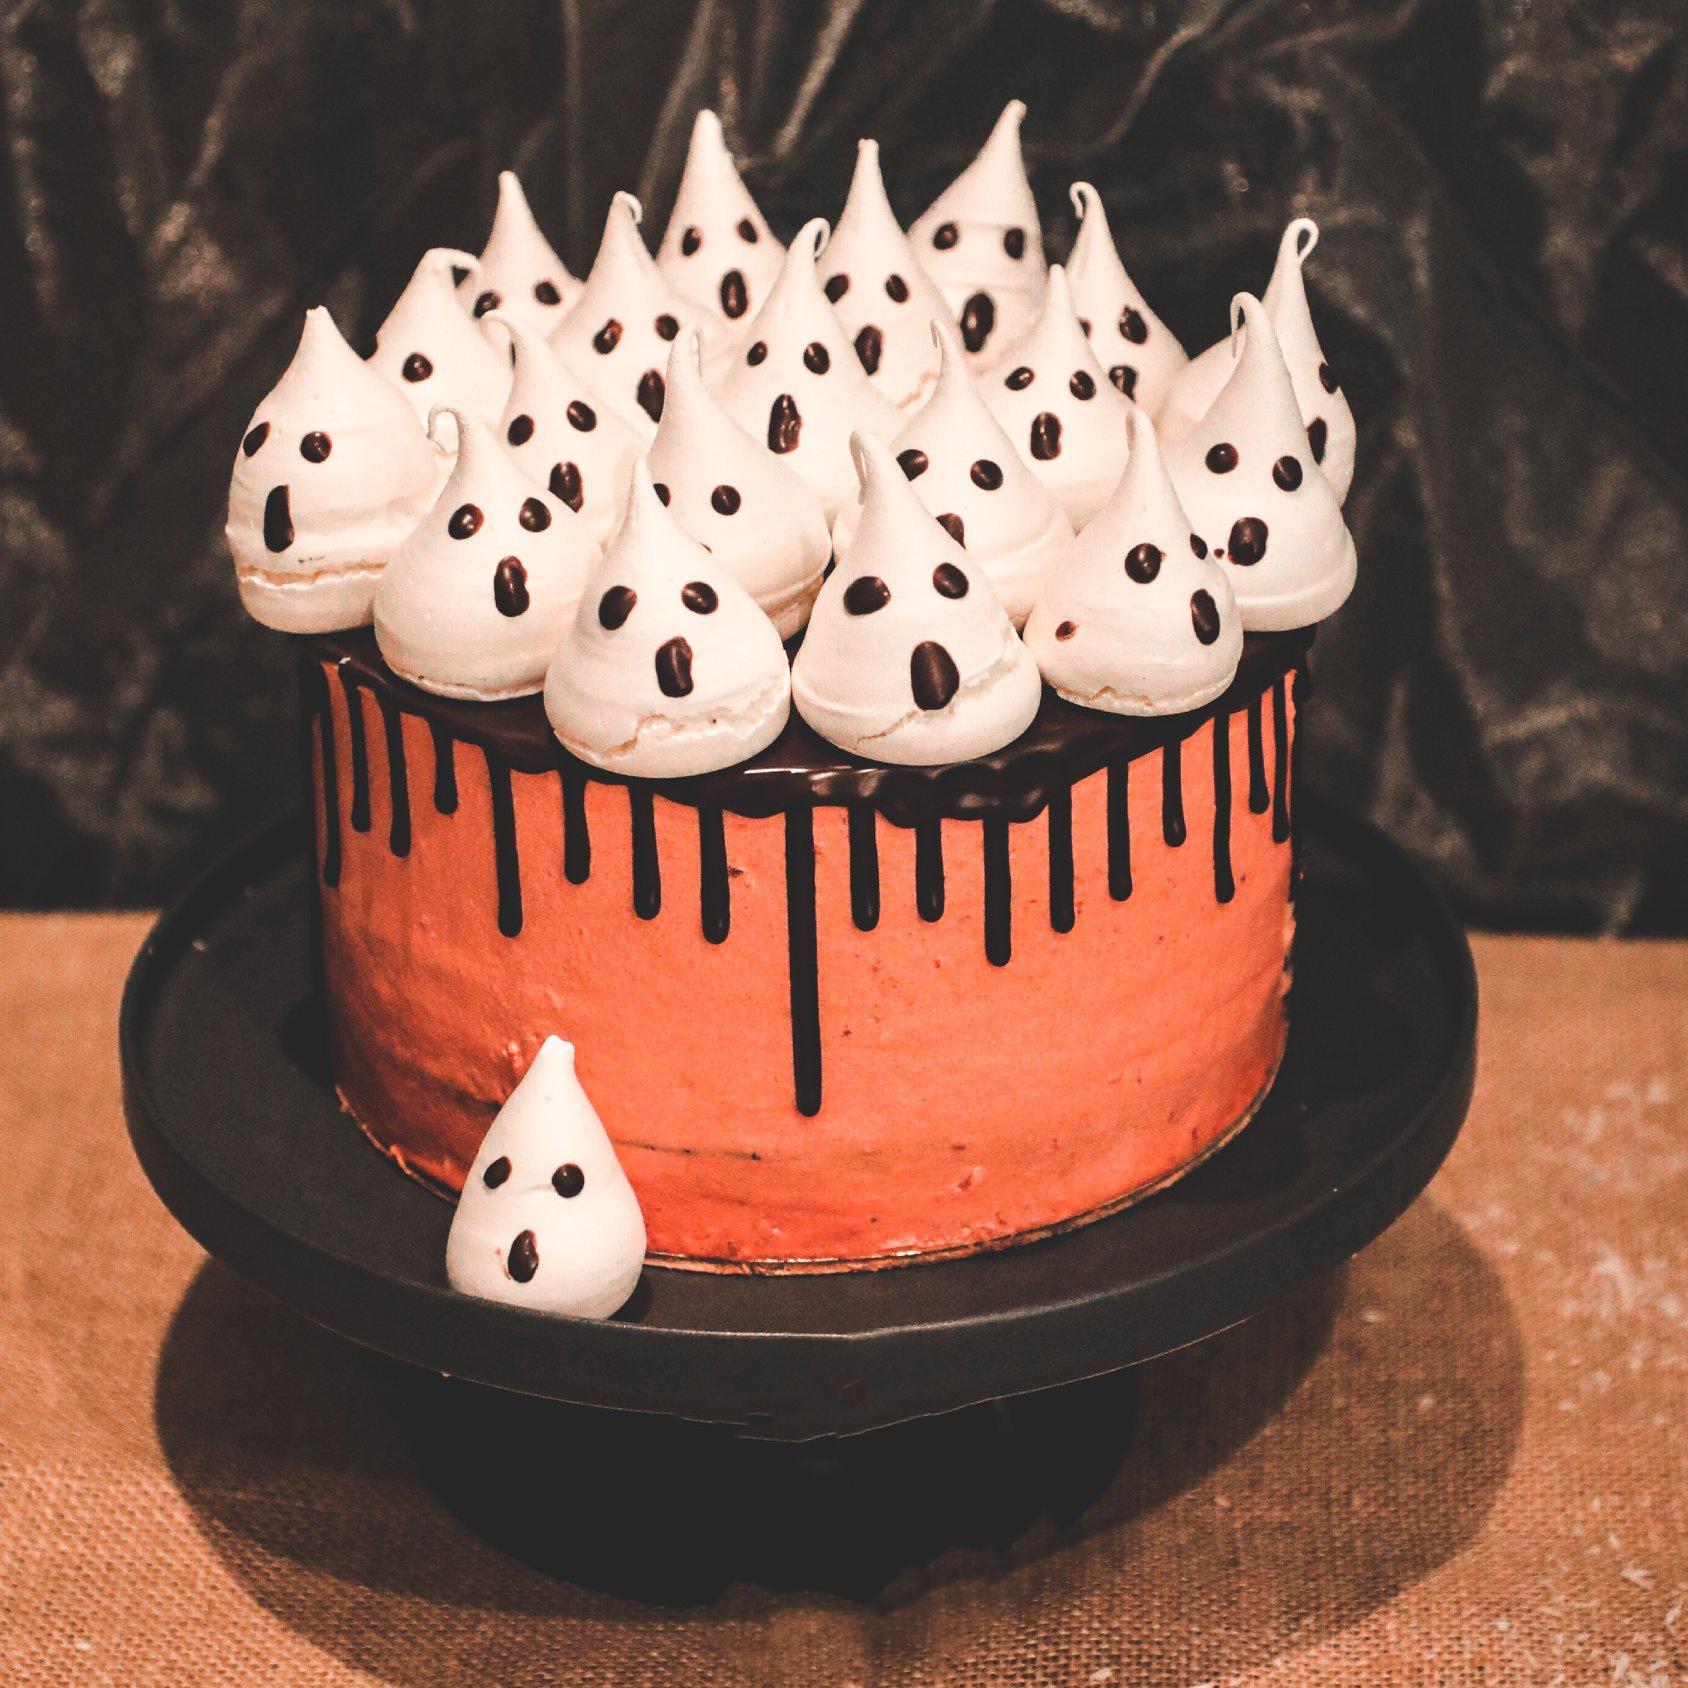 bolo-fantasmas-personalizados-pastelaria-entrega-casa-cale-confeitaria-tradicional-portuguesa-peniche-caldas-rainha-padaria-pastelaria